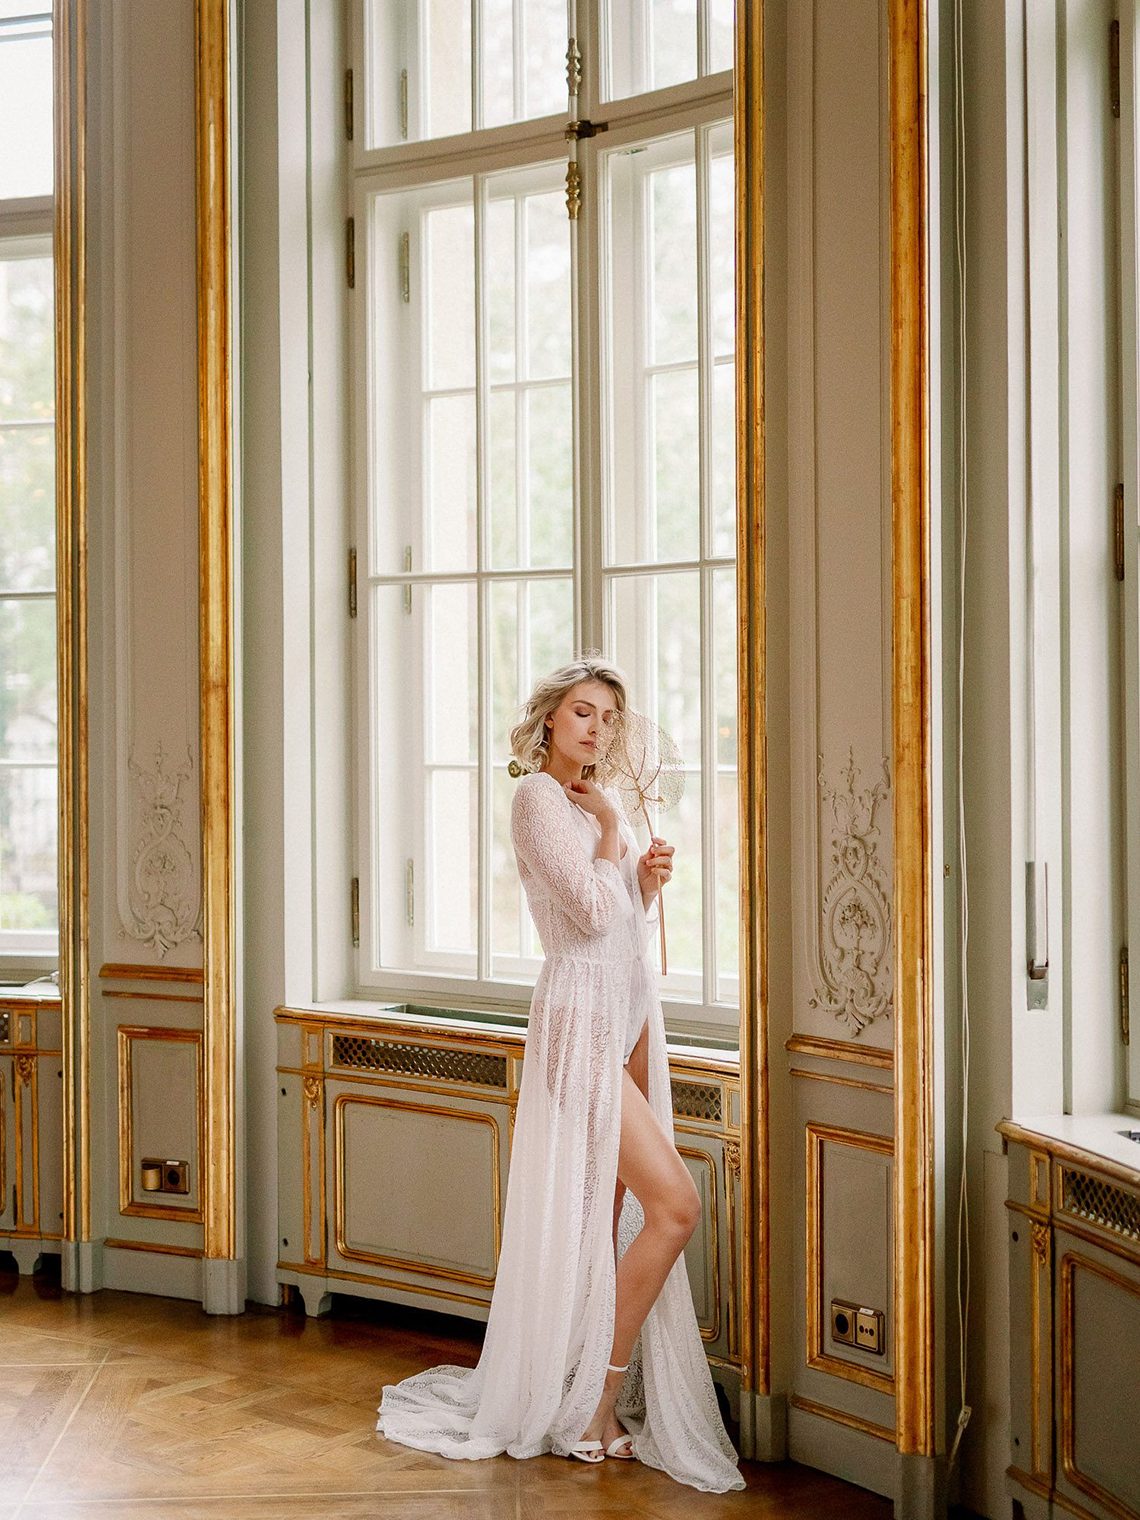 Luxurious Same Sex Wedding Inspiration at Roccoco Palace – Miss Universe Germany – BERTA wedding dress – Vivid Symphony 12